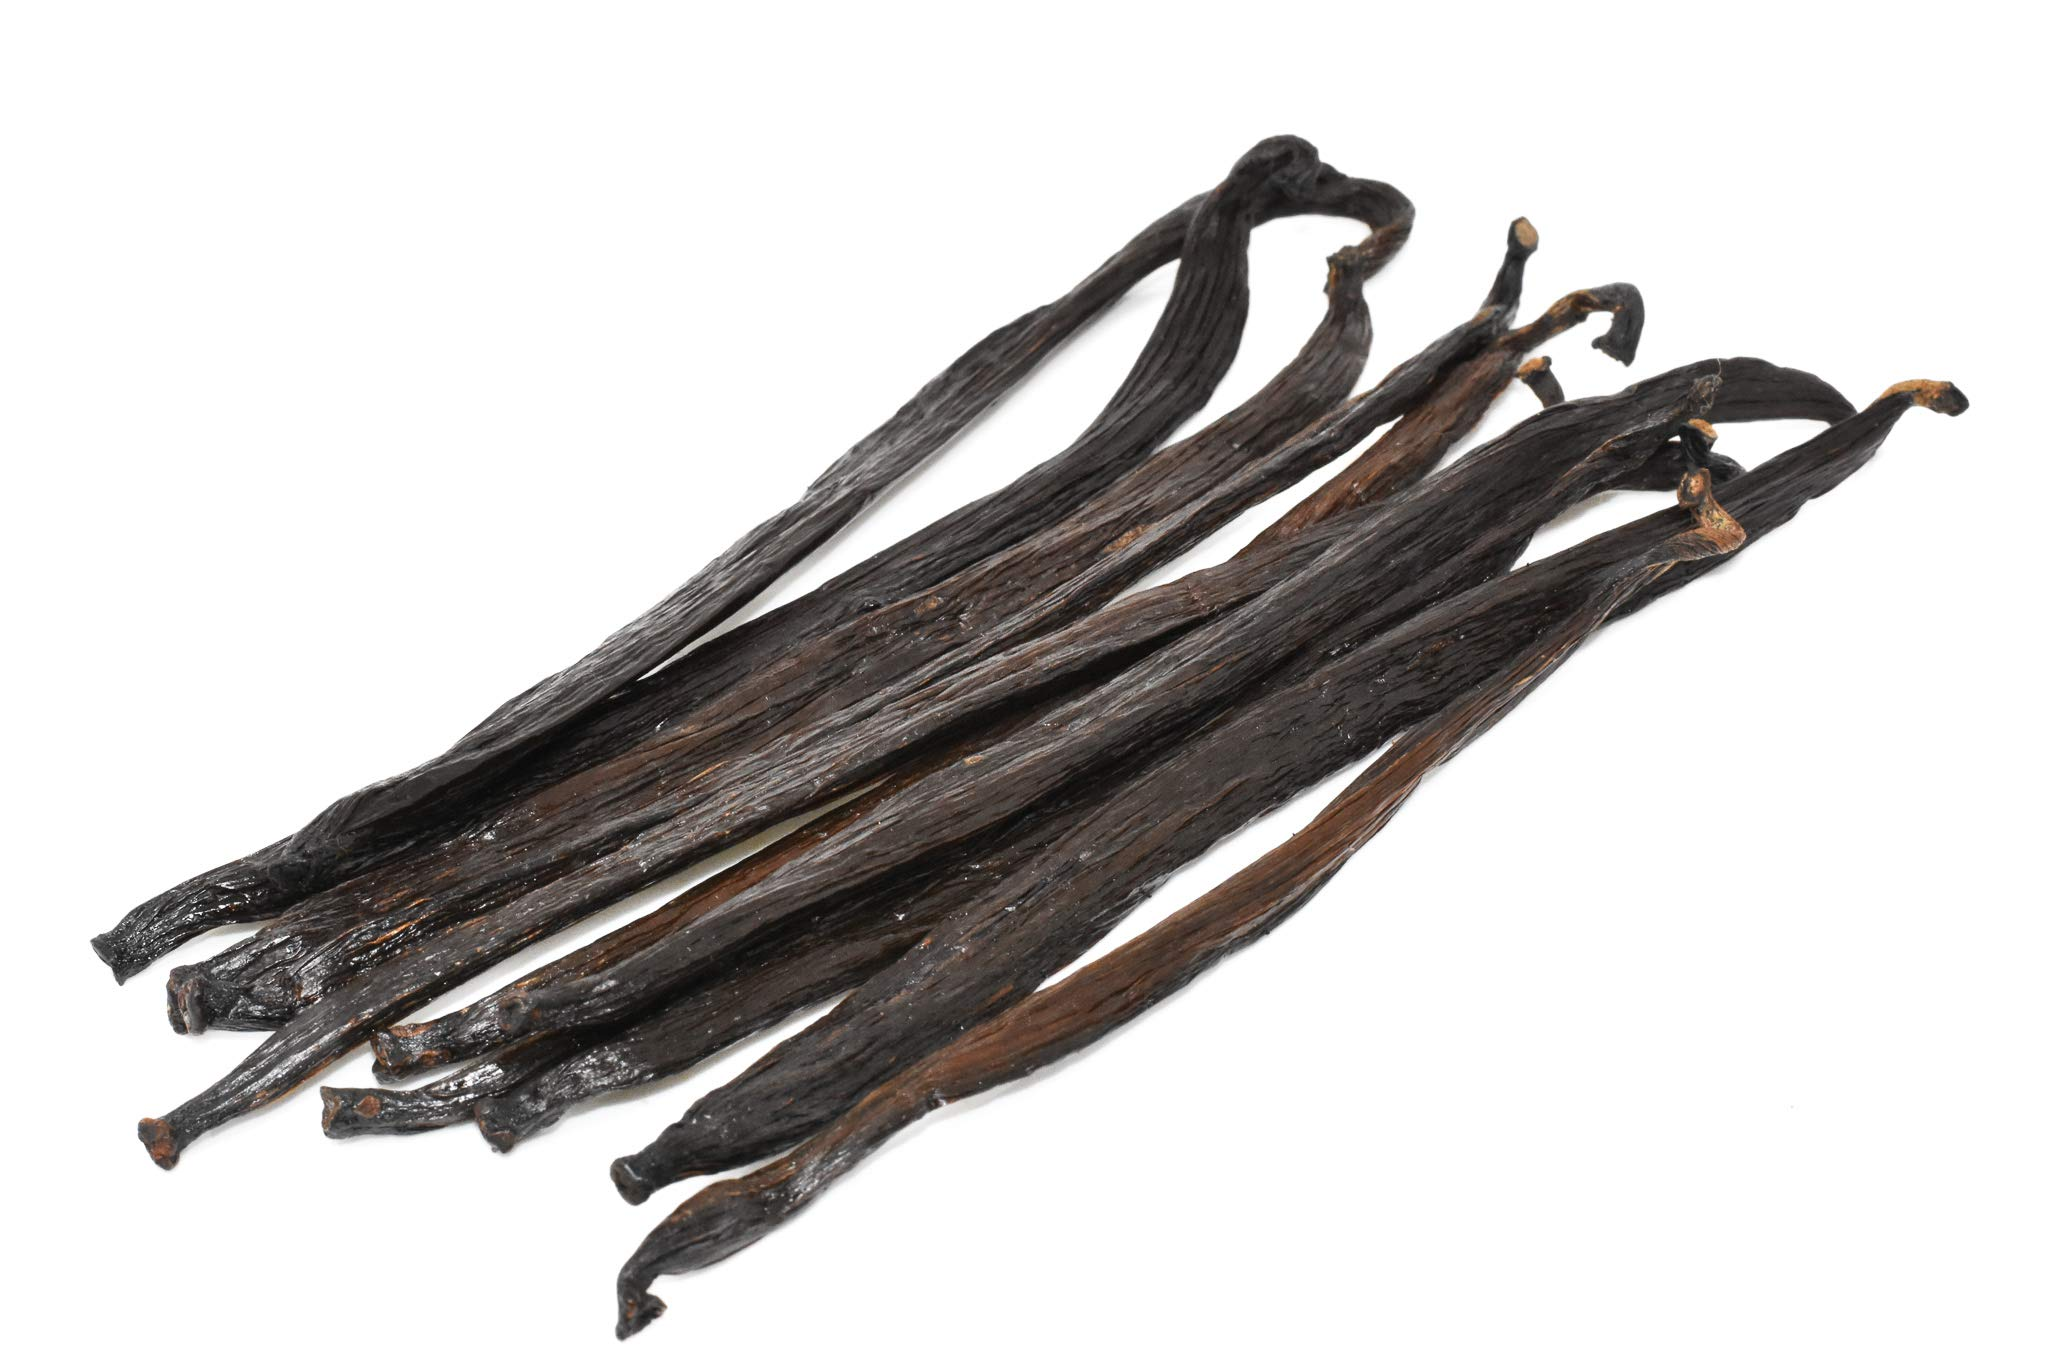 Extract Grade Vanilla Beans by Slofoodgroup 12-14 cm (various sizes available) Grade B Vanilla beans (10 extract vanilla beans)